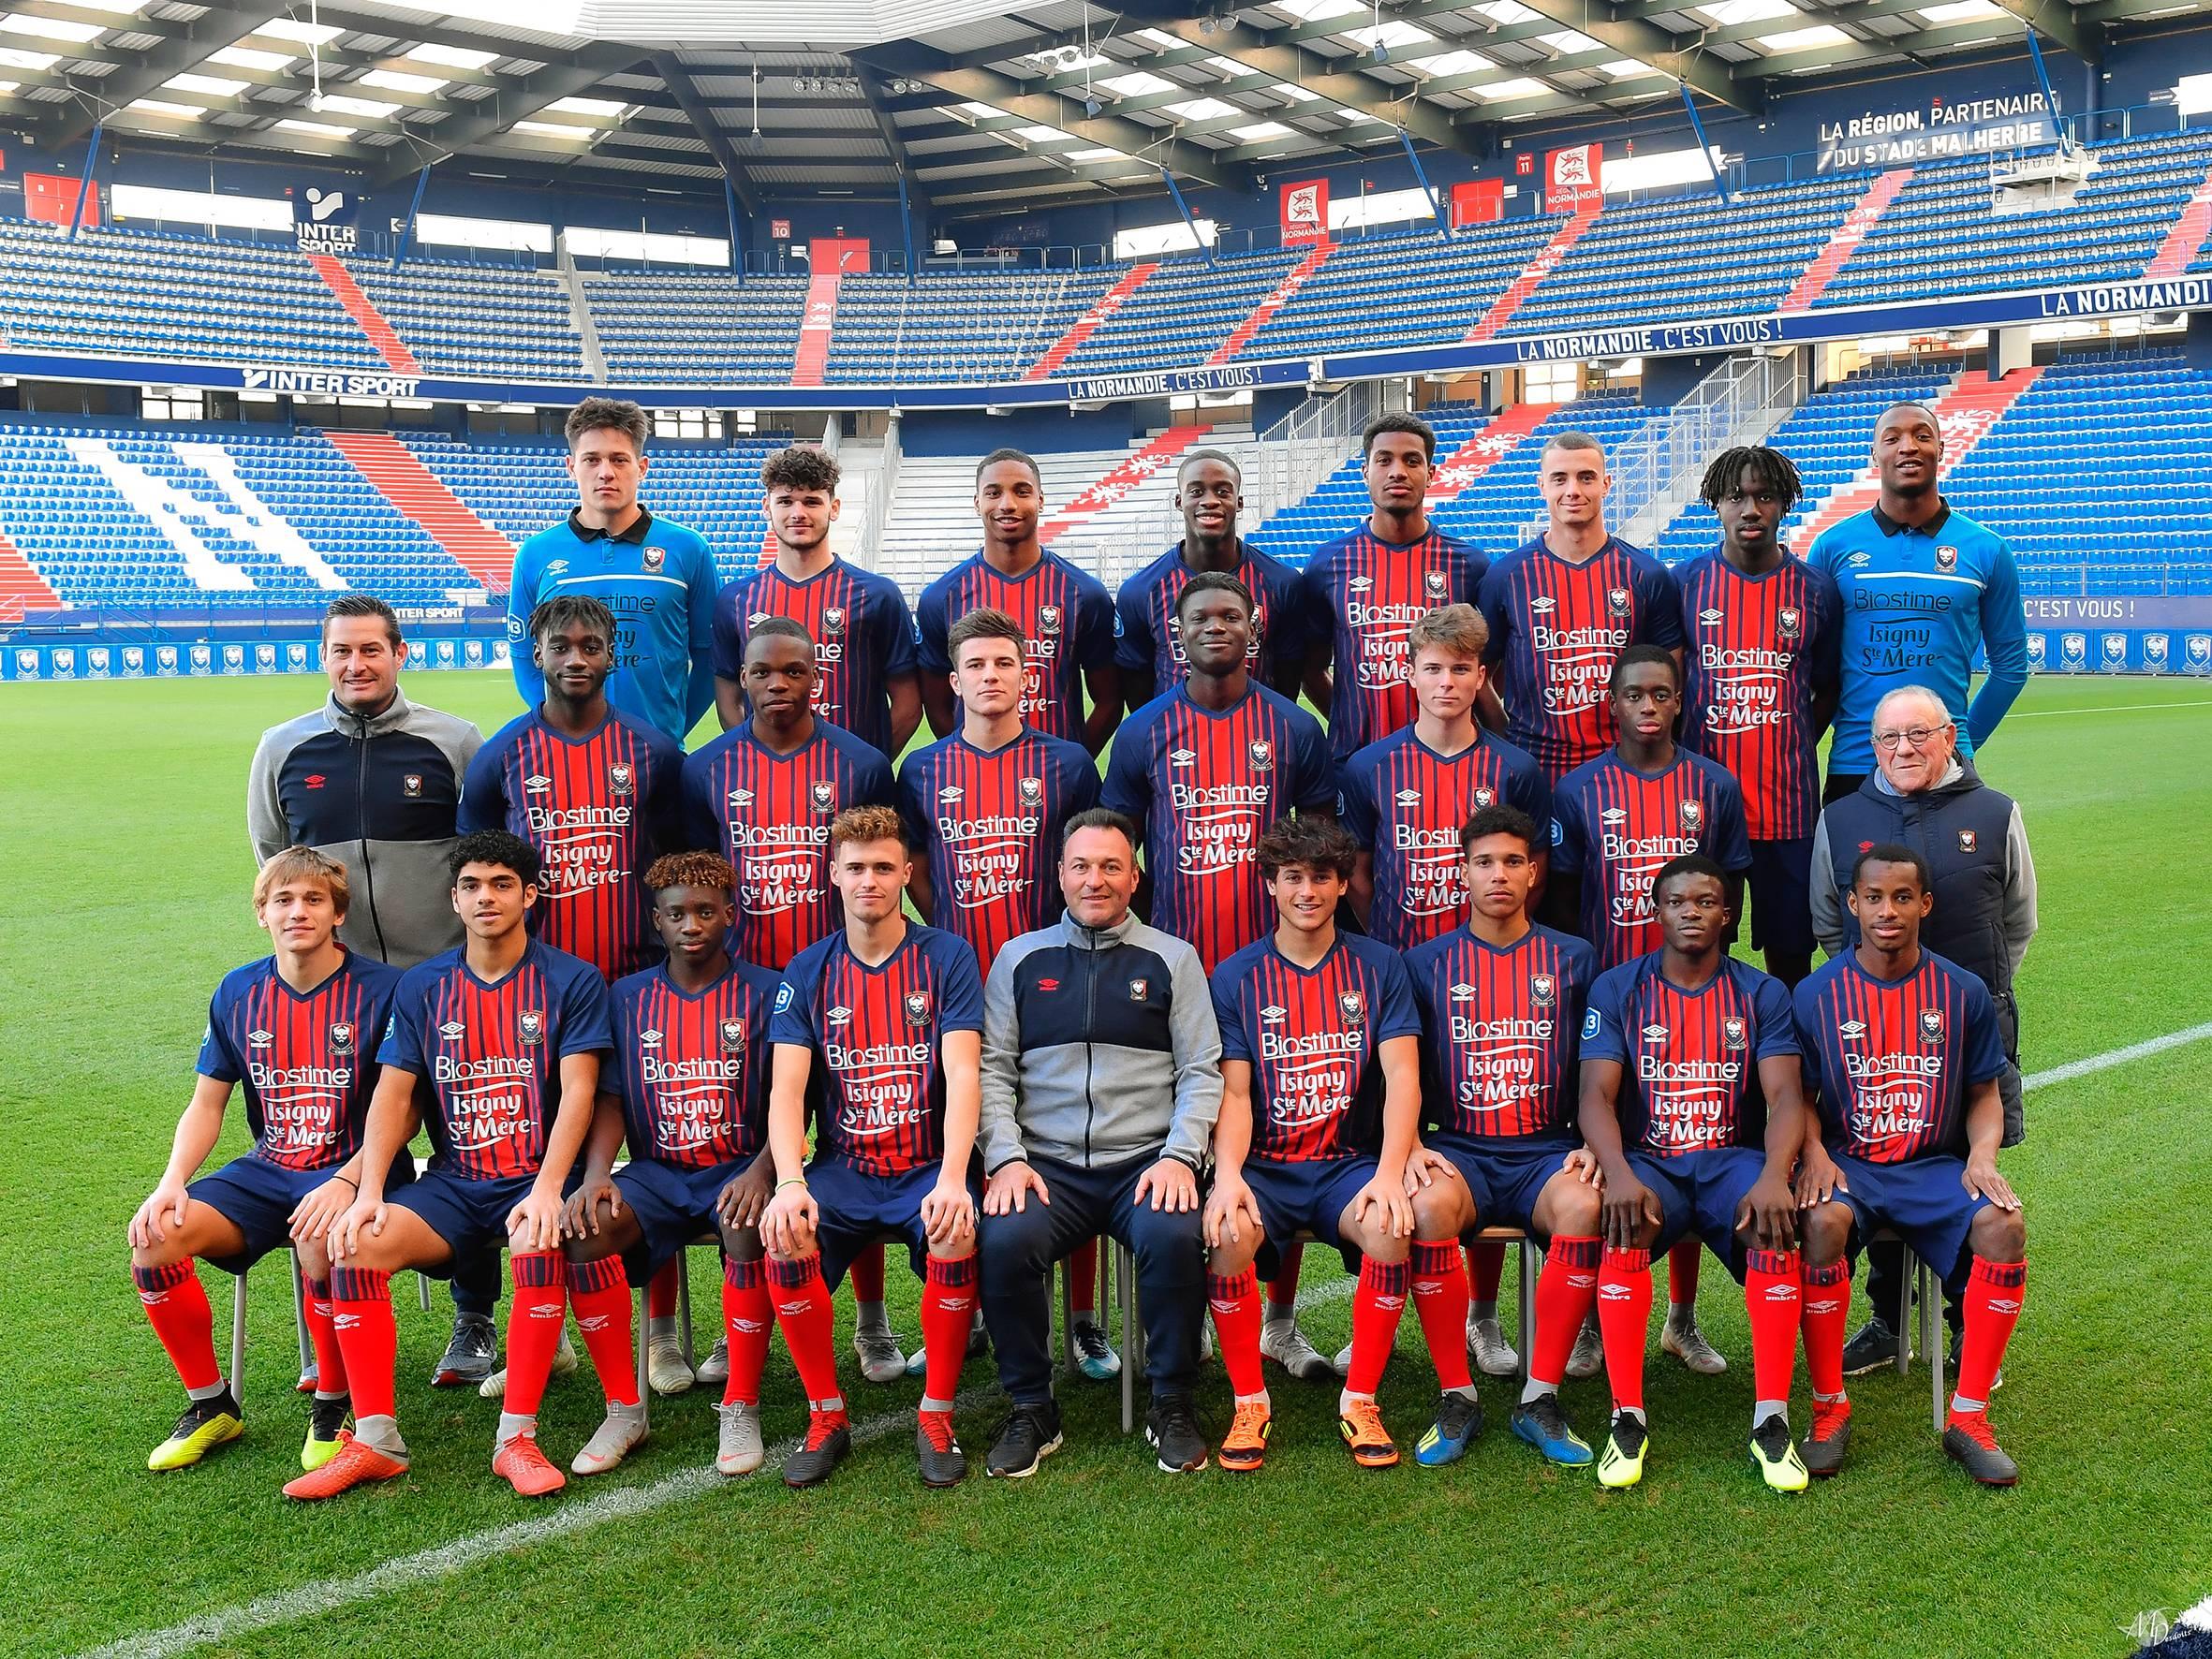 Stade Malherbe Caen Calvados Basse-Normandie - équipe Réserve 2018-2019